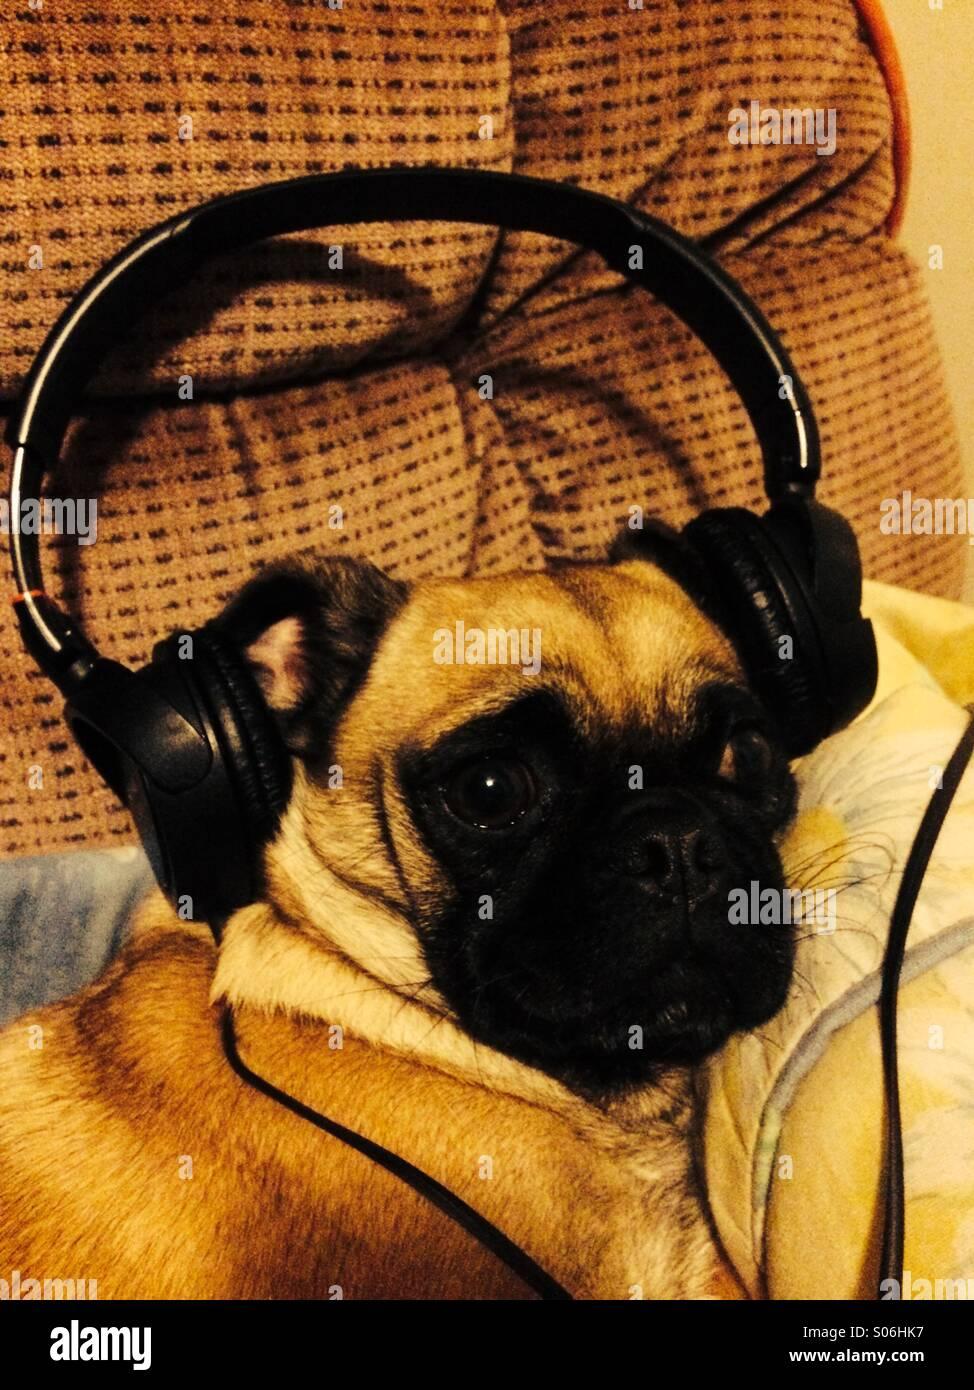 Headphone Pug - Stock Image